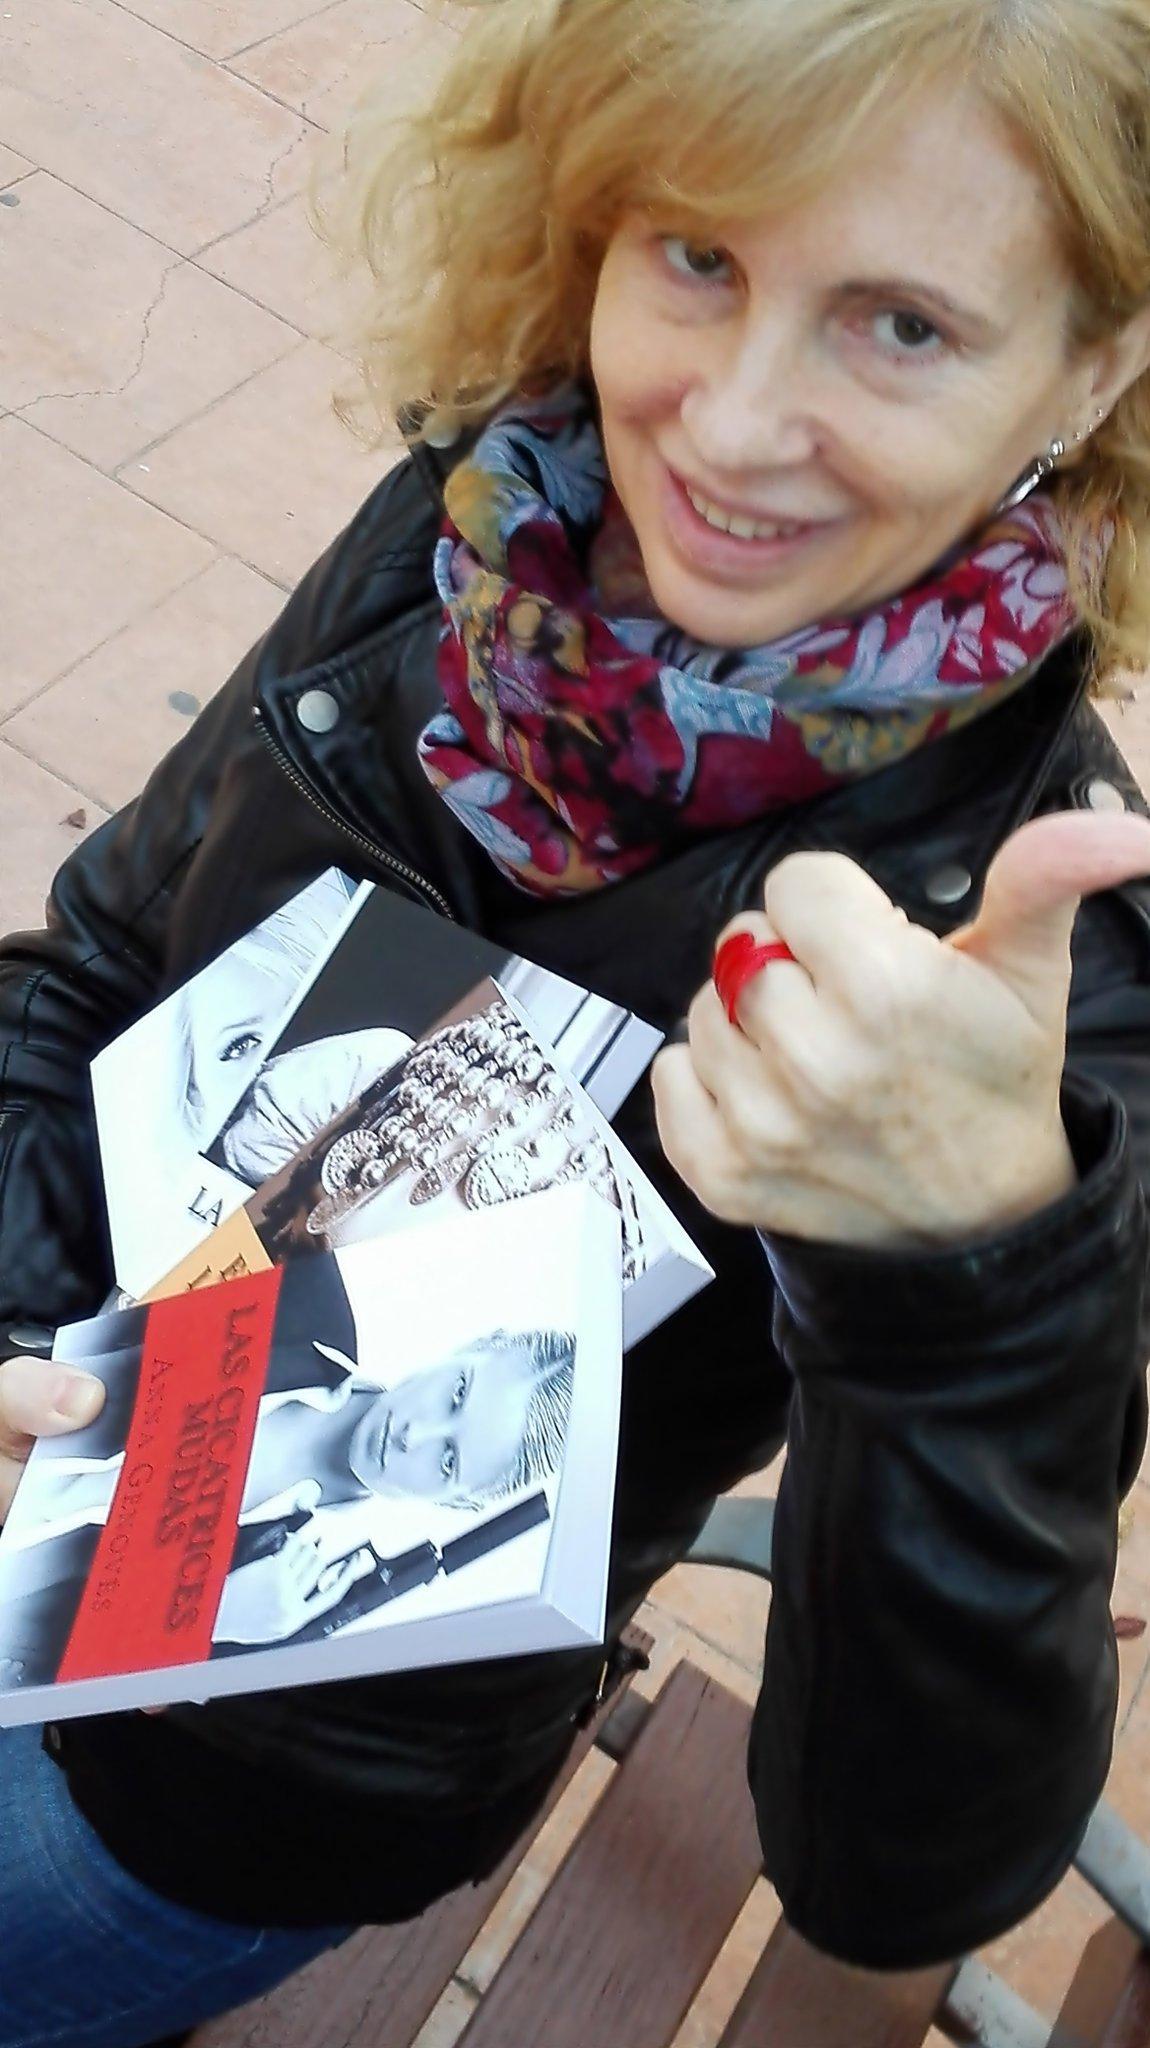 Entrevista Anna Genovés sb las 20:20h LA HORA ROMÁNTICA de Cecilia Pérez - Divin@s Lectoras https://t.co/kGj3Fk6phf https://t.co/3aW93TPsfE